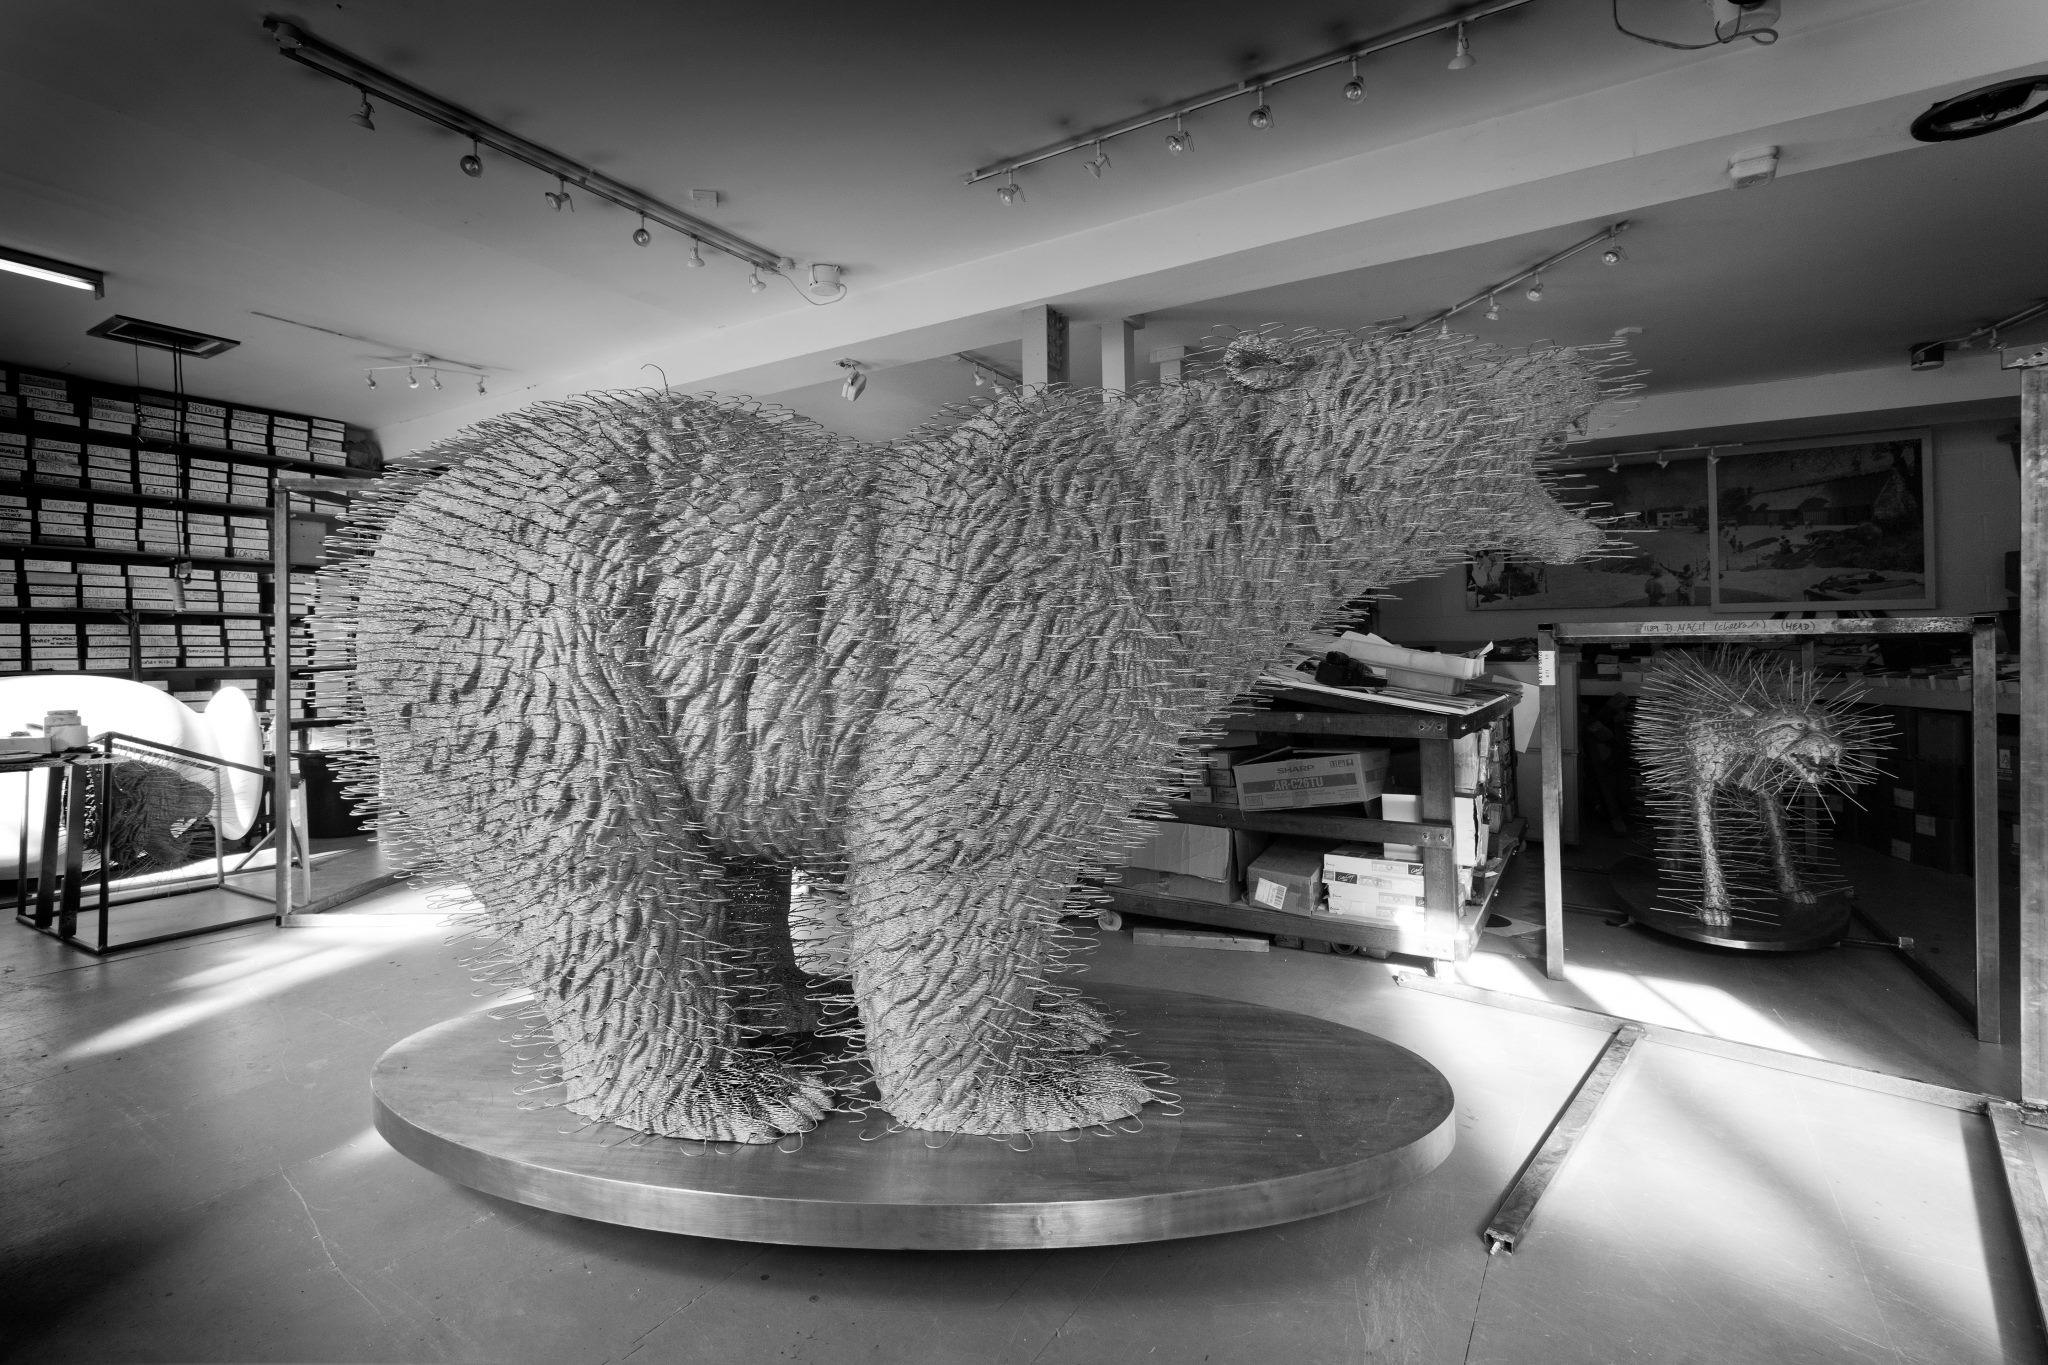 pola bear